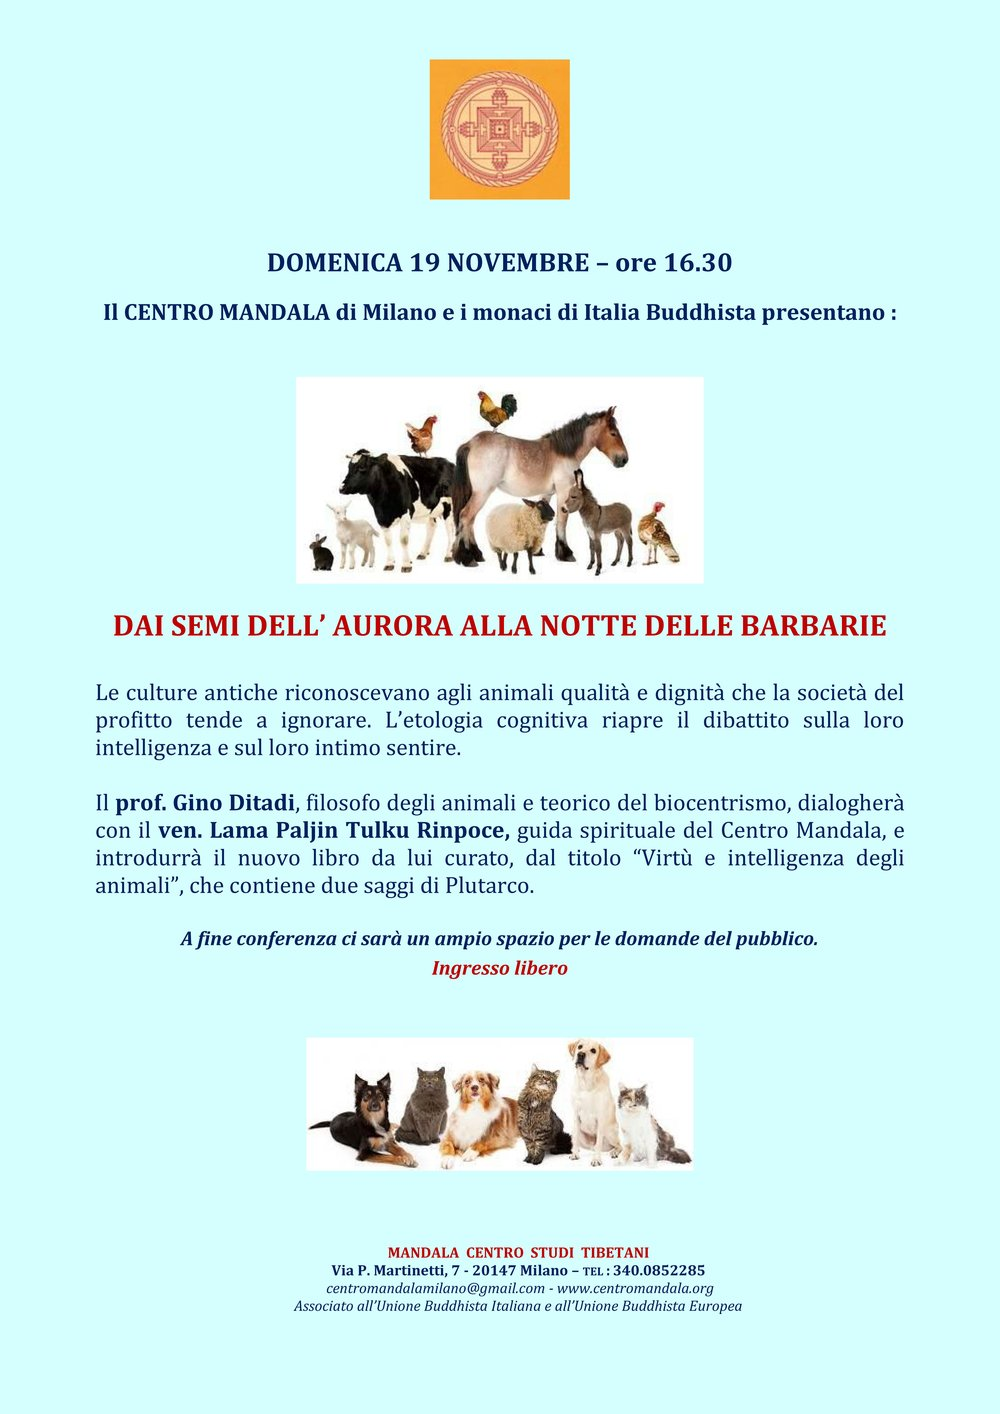 FRATELLO ANIMALE Centro Mandala 19 novembre 2017.jpg